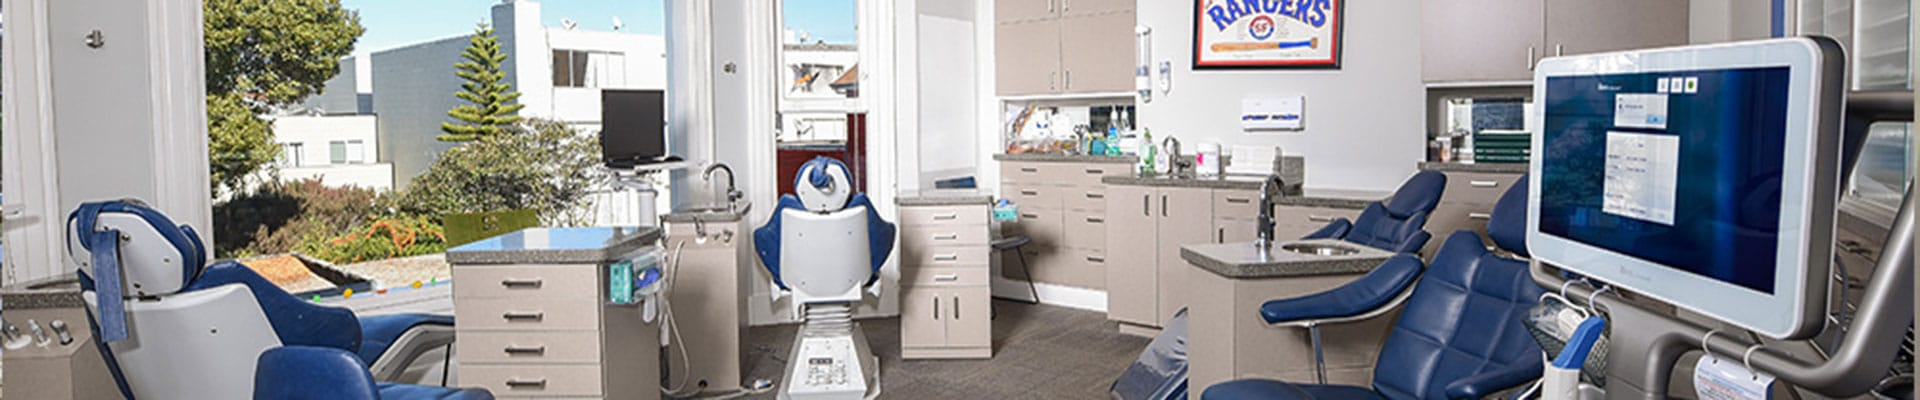 Union Office Cucalon Orthodontics in San Francisco, CA